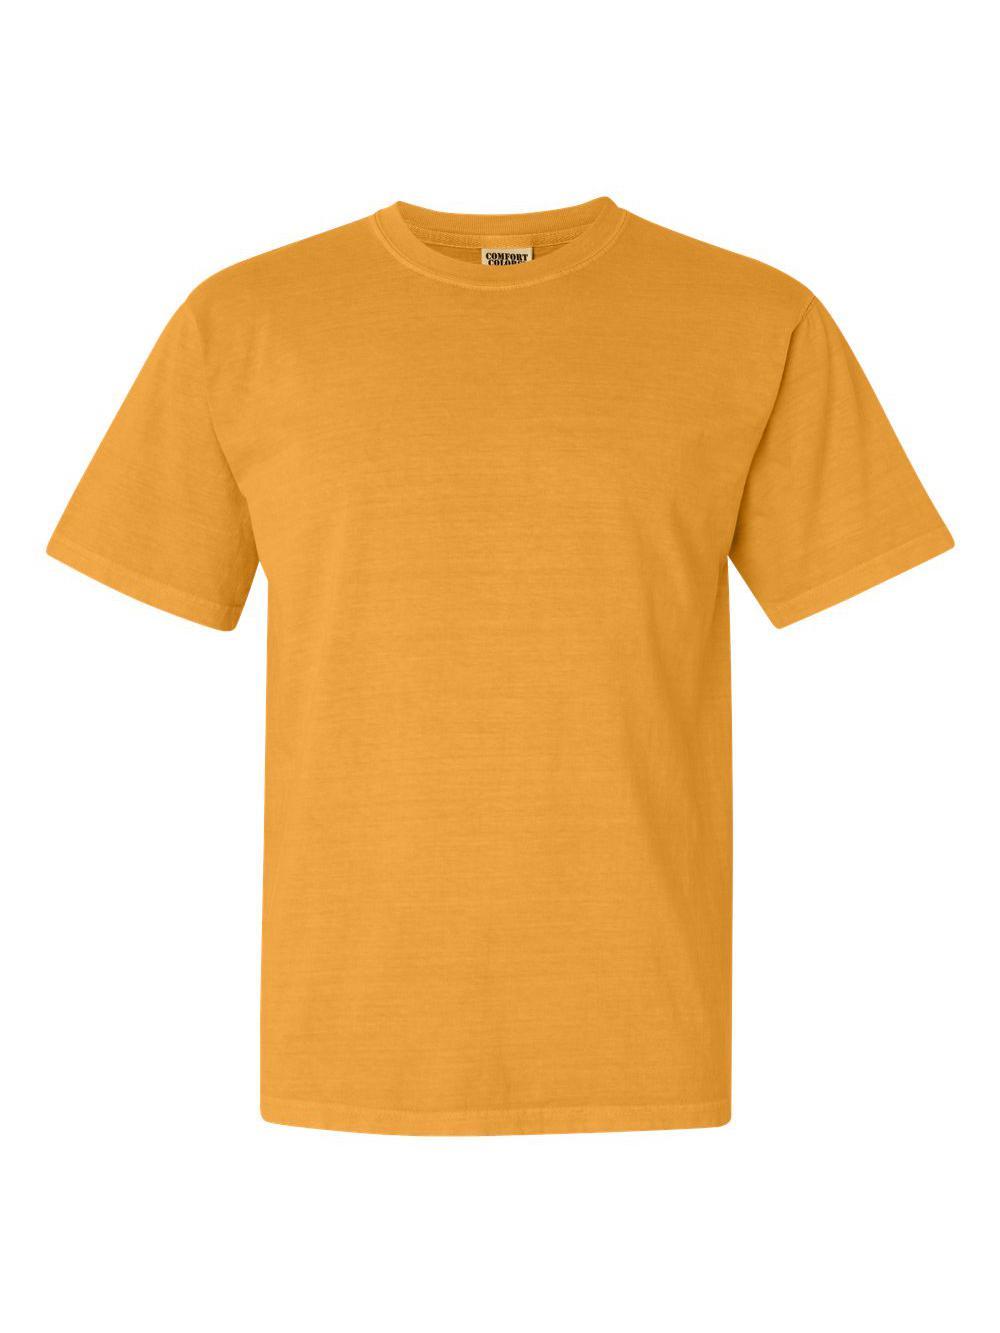 Comfort-Colors-Garment-Dyed-Heavyweight-Ringspun-Short-Sleeve-Shirt-1717 thumbnail 39